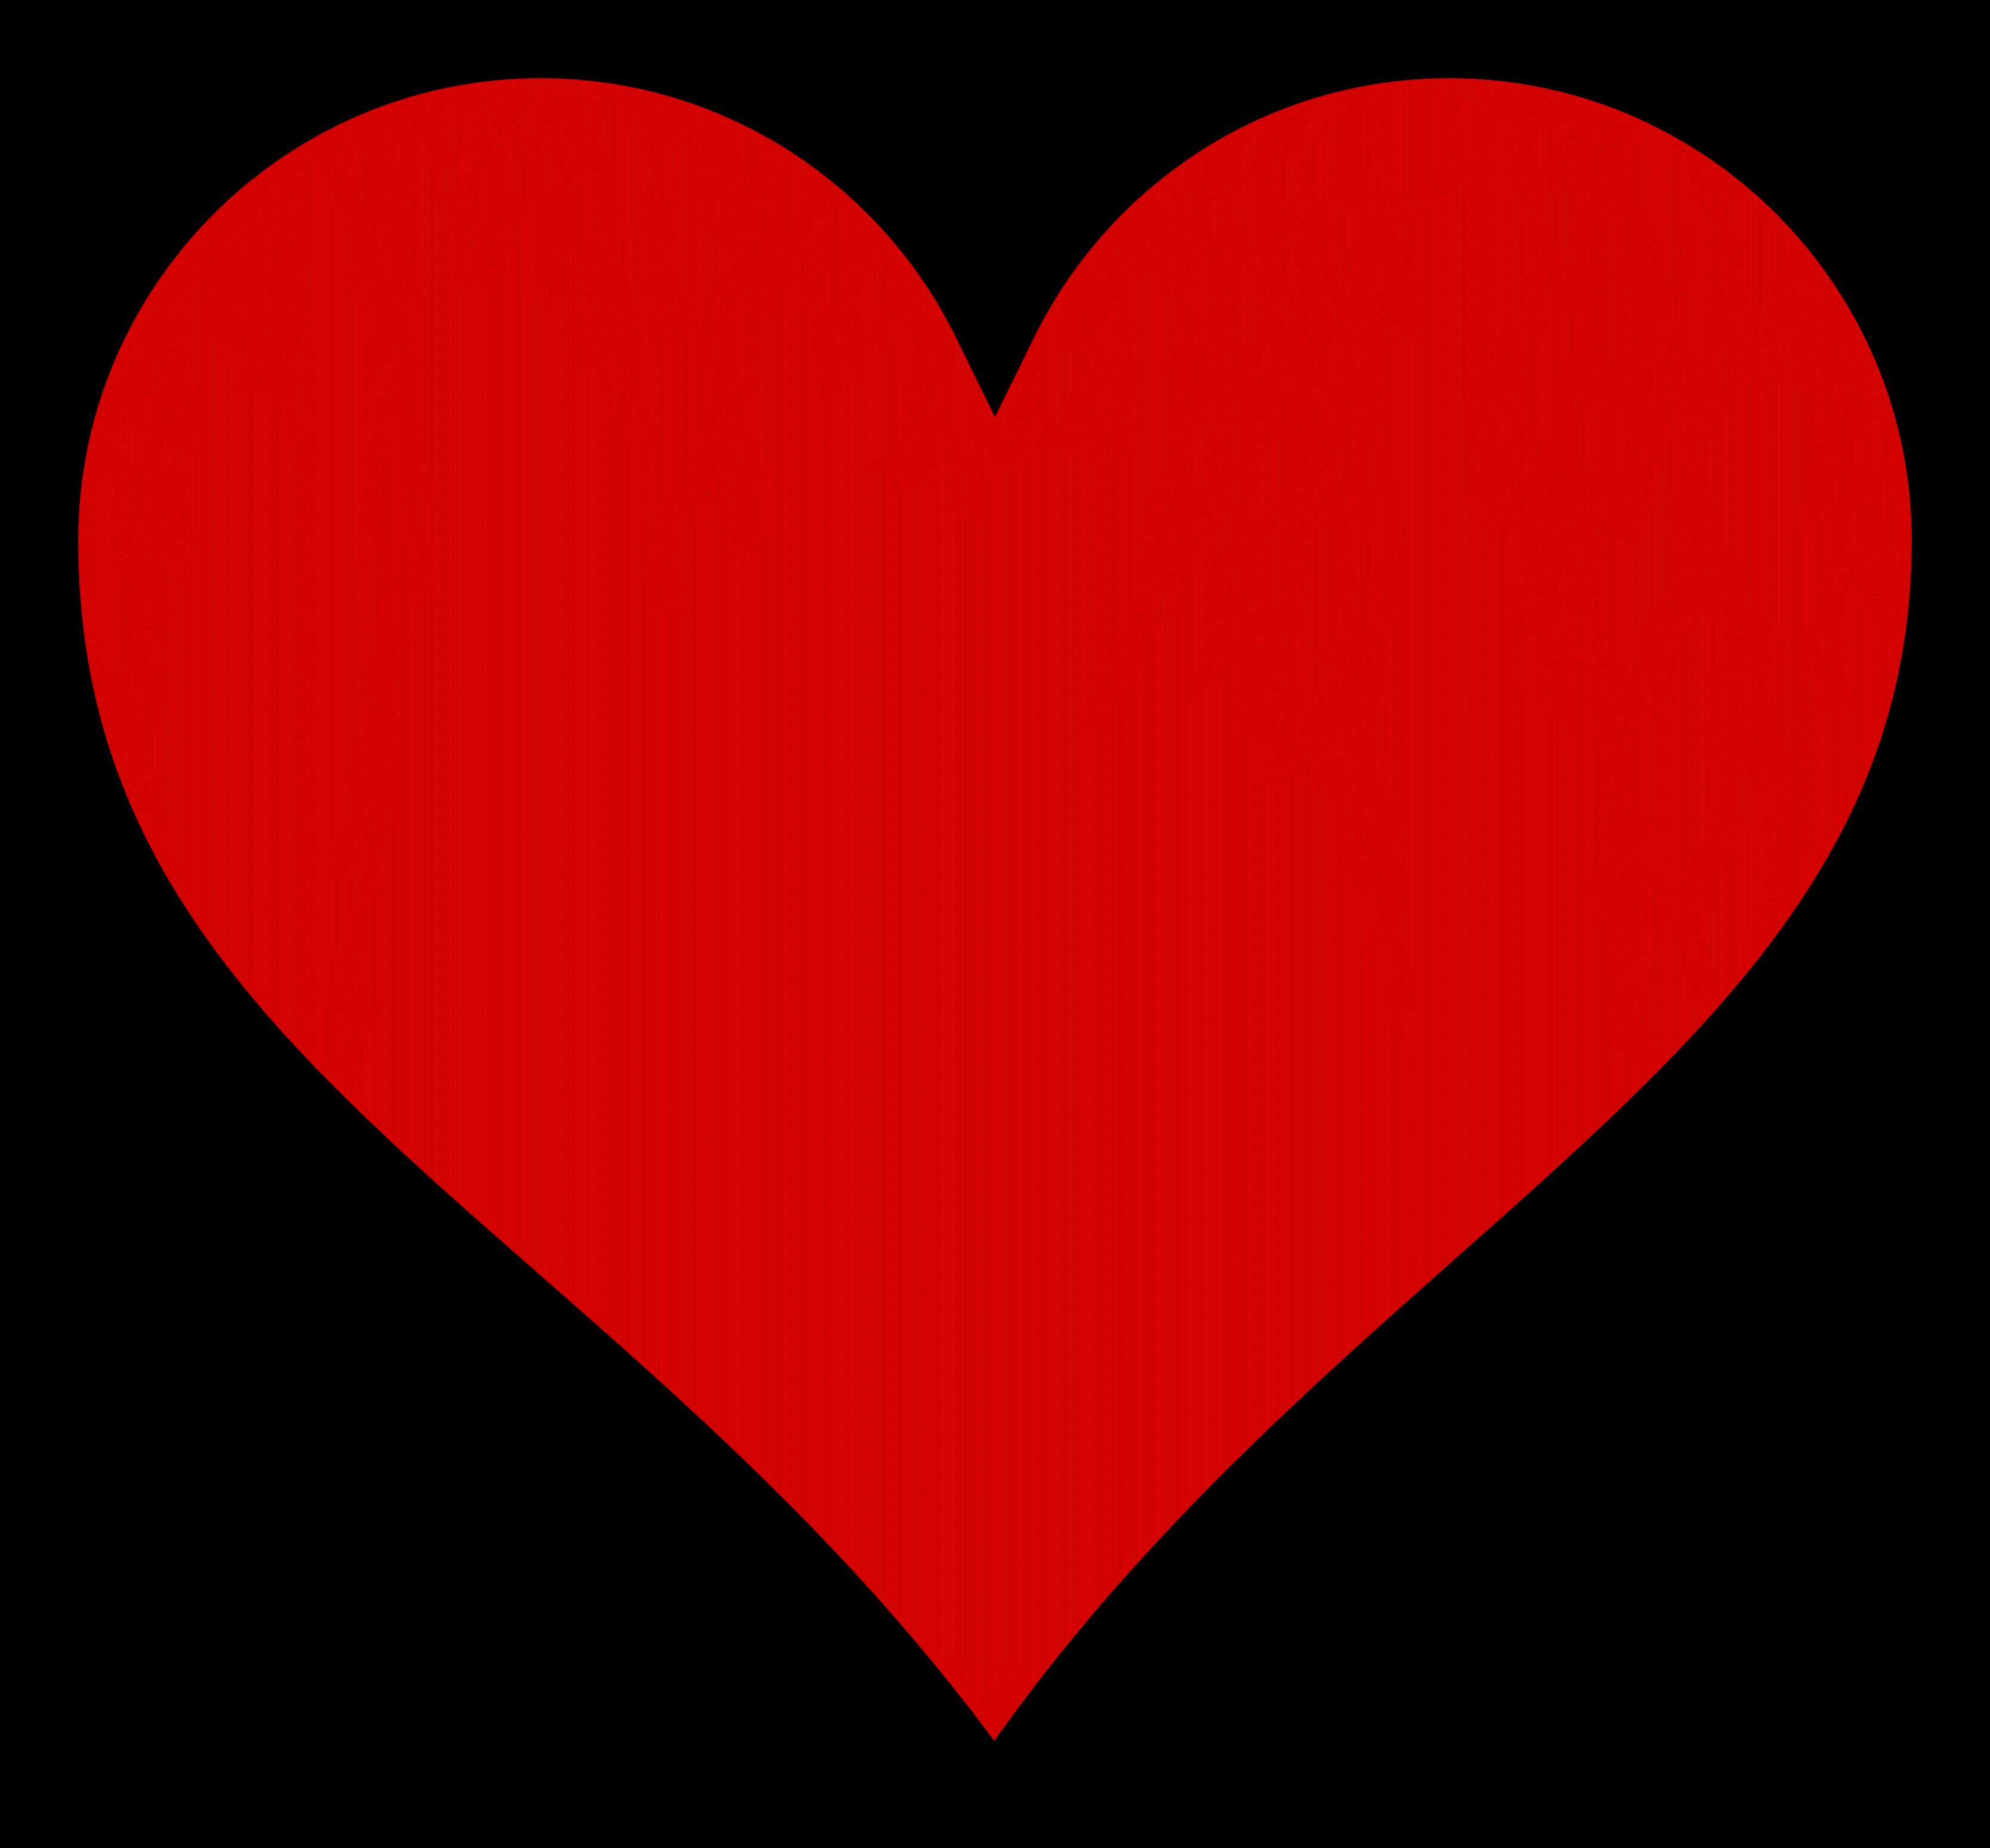 Clipart heart body. Cliparts zone cute